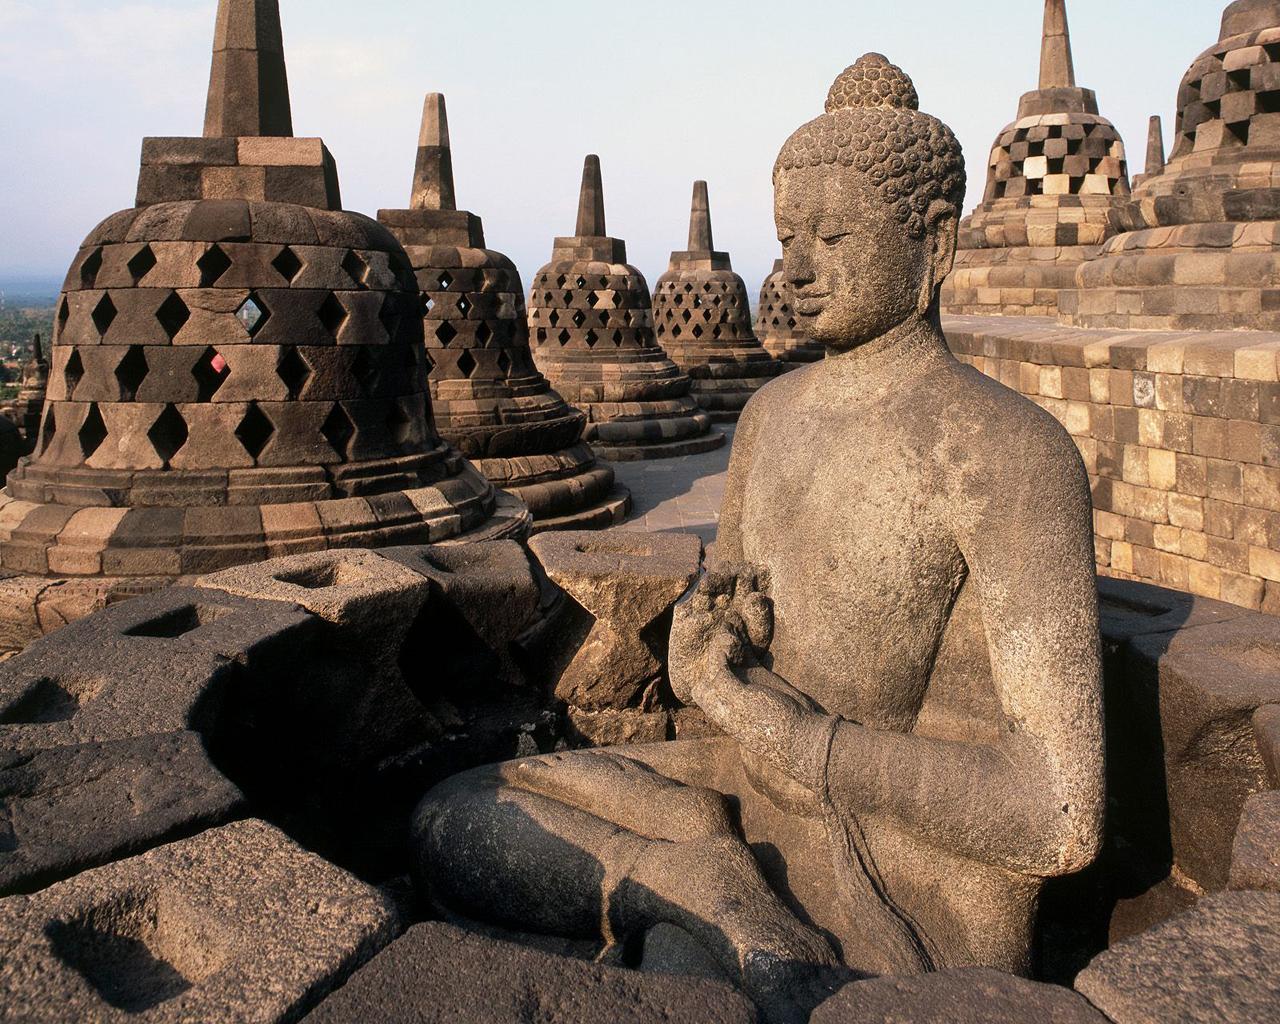 Monumente ale spiritualitatii in Indonezia